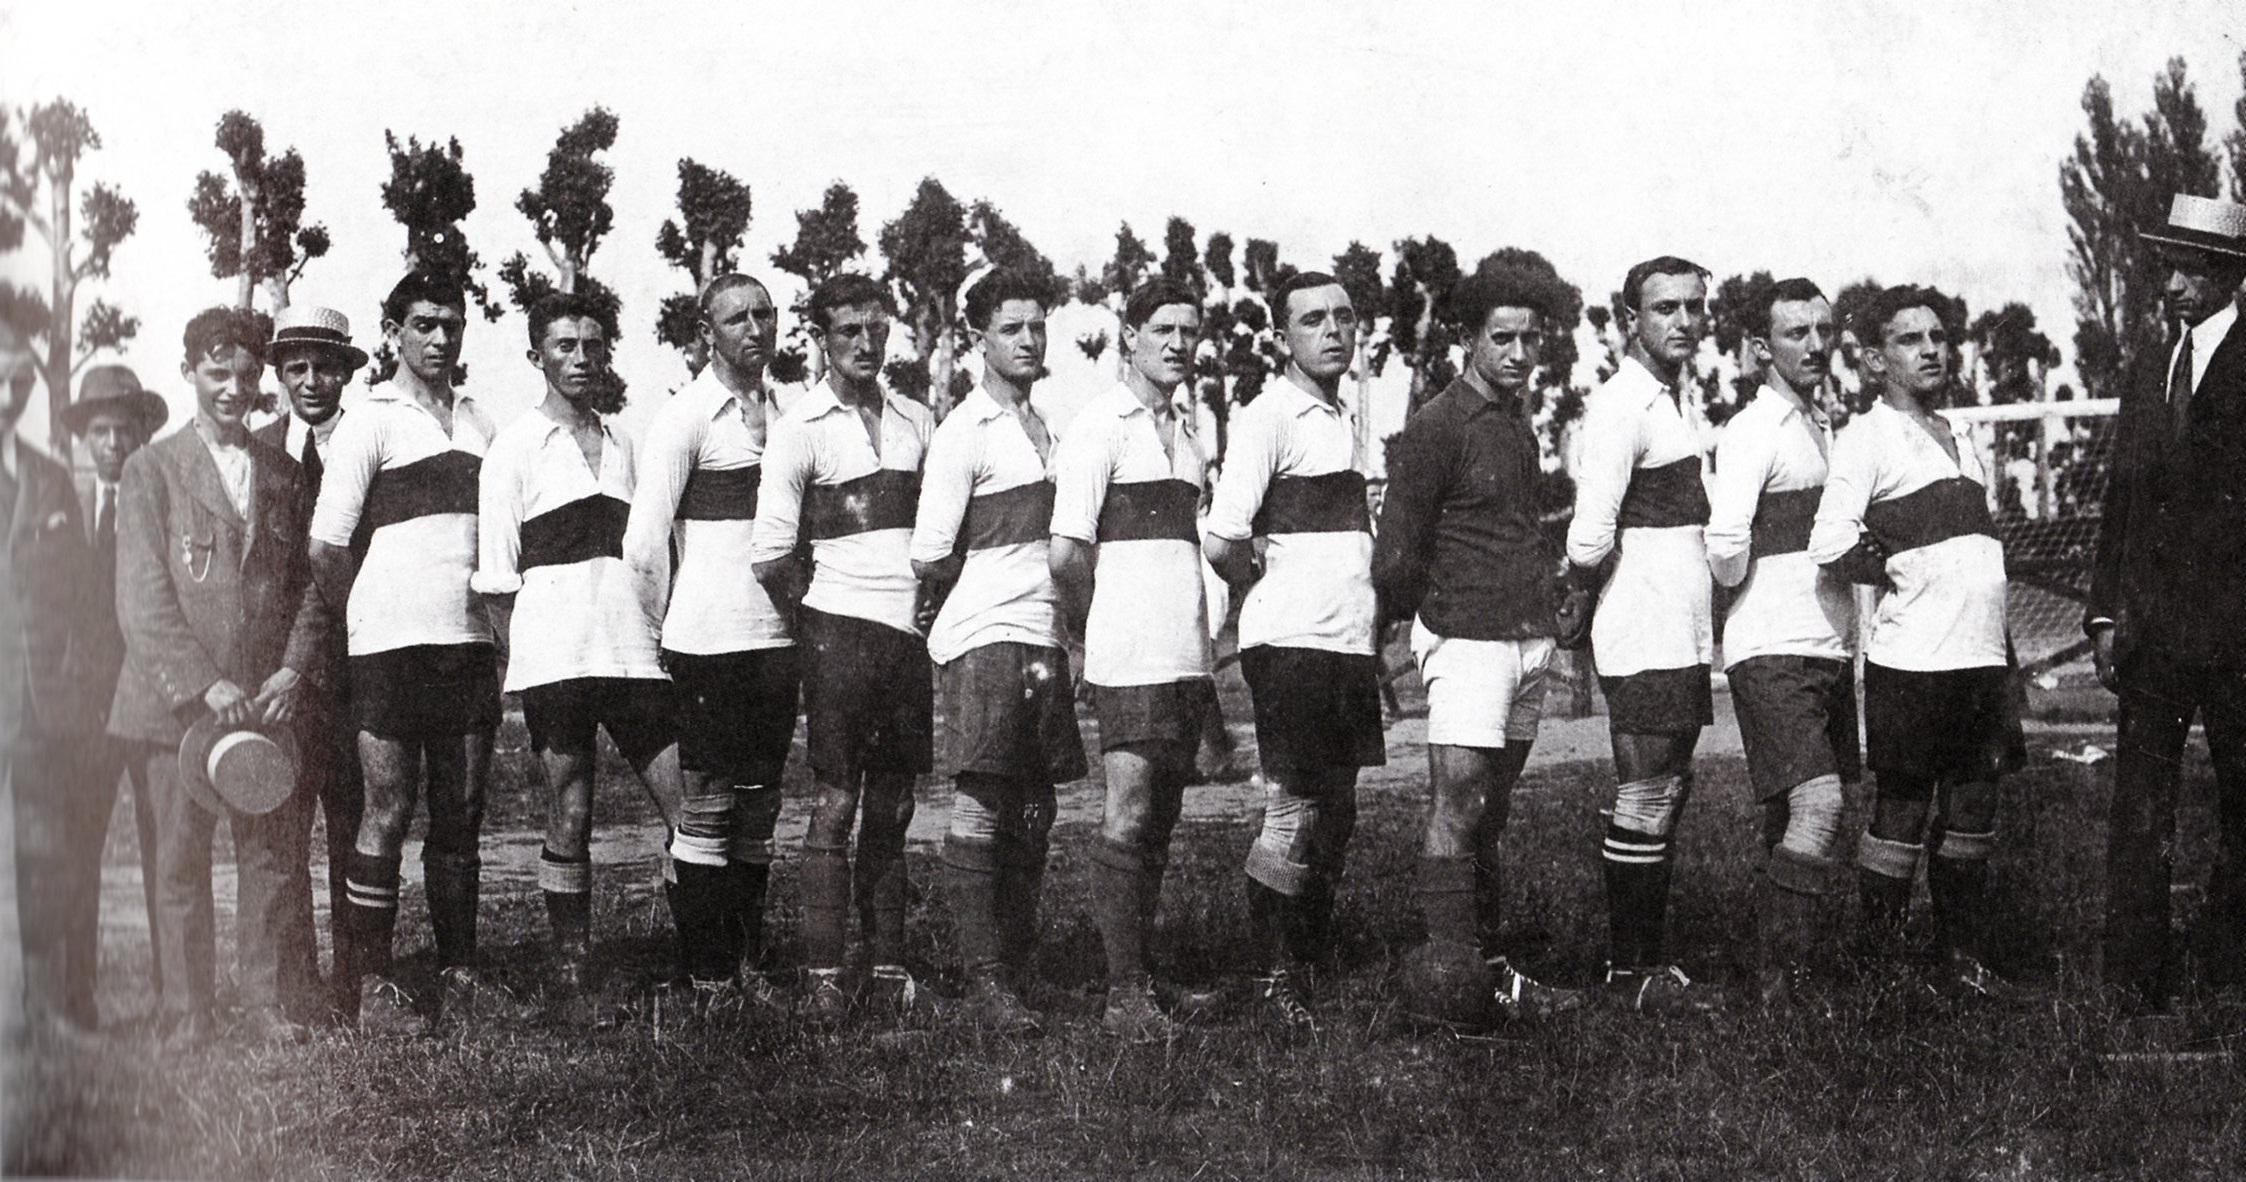 1920-LUS-Alessandria-da-sinistra-Talamazzini-Scevola-Canobbio-Barberis-Sperati-Scovenna-Capra-I-Orgero-Lazoli-II-Poggi-Montanari-I.-In-borghese-Ugo-Milano.